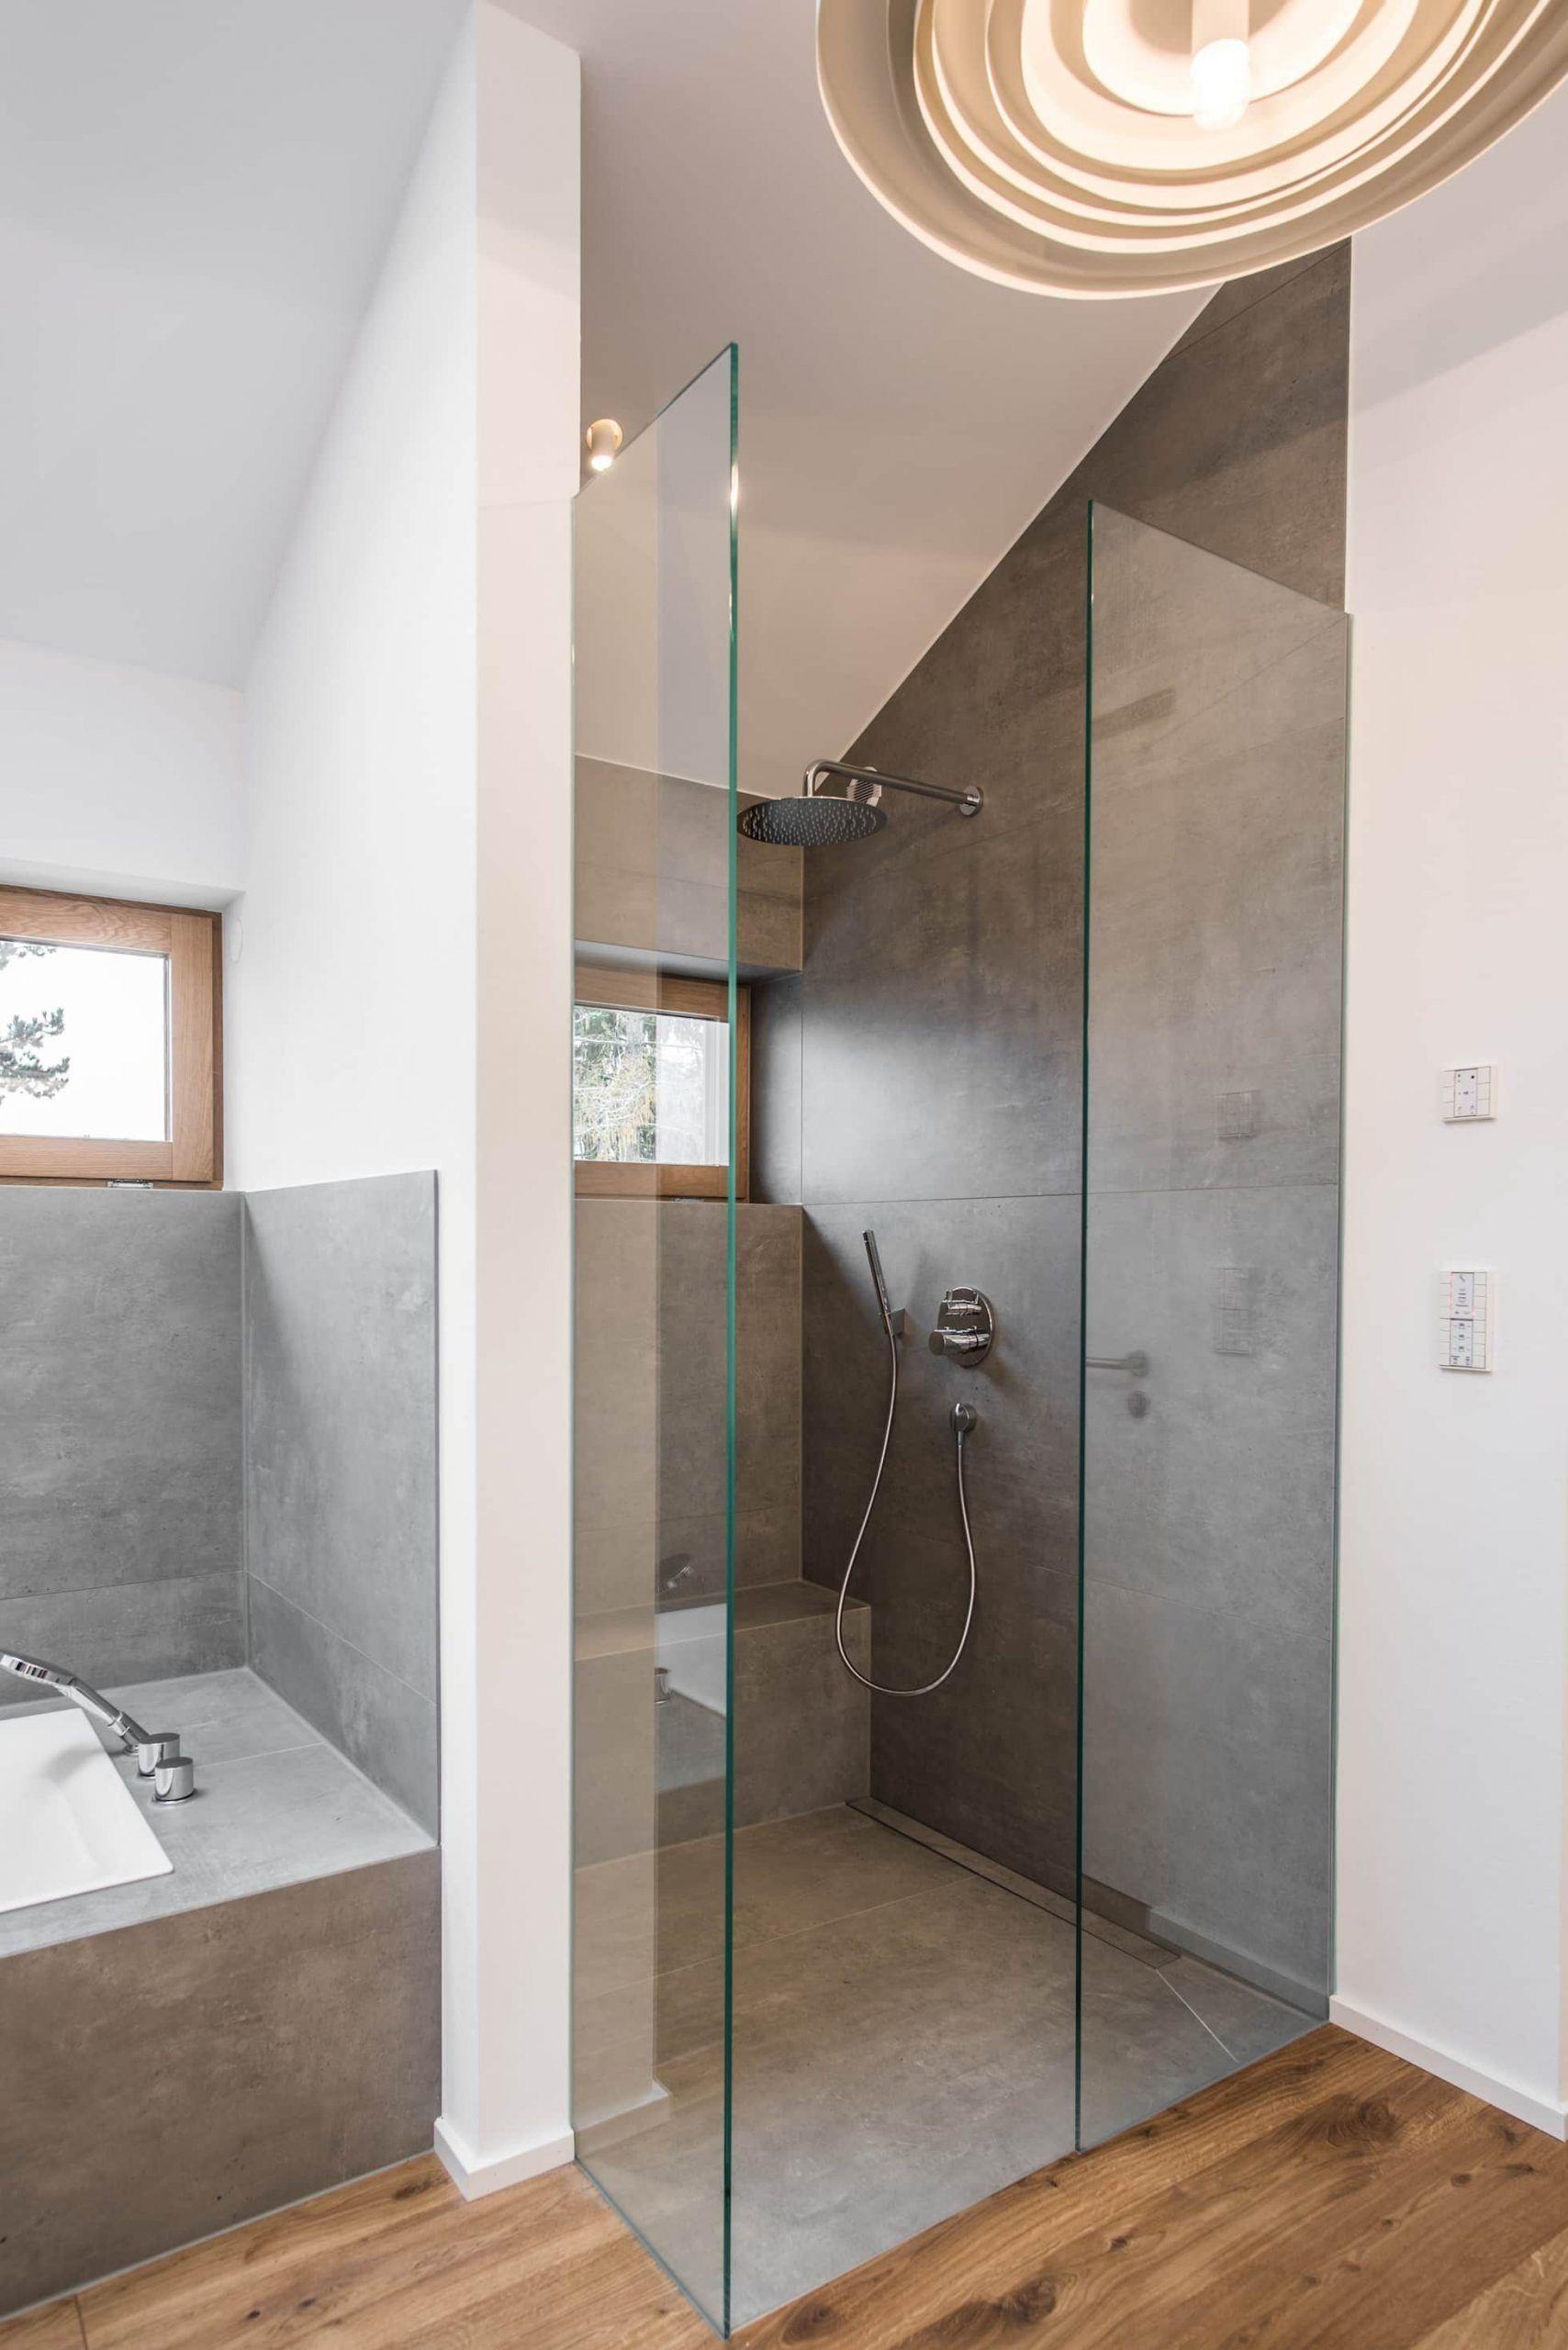 Badezimmer Dusche Moderne Badezimmer Von Mannsperger Mobel Raumdesign Modern En 2020 Salle De Bains Moderne Idee Salle De Bain Salle De Douche